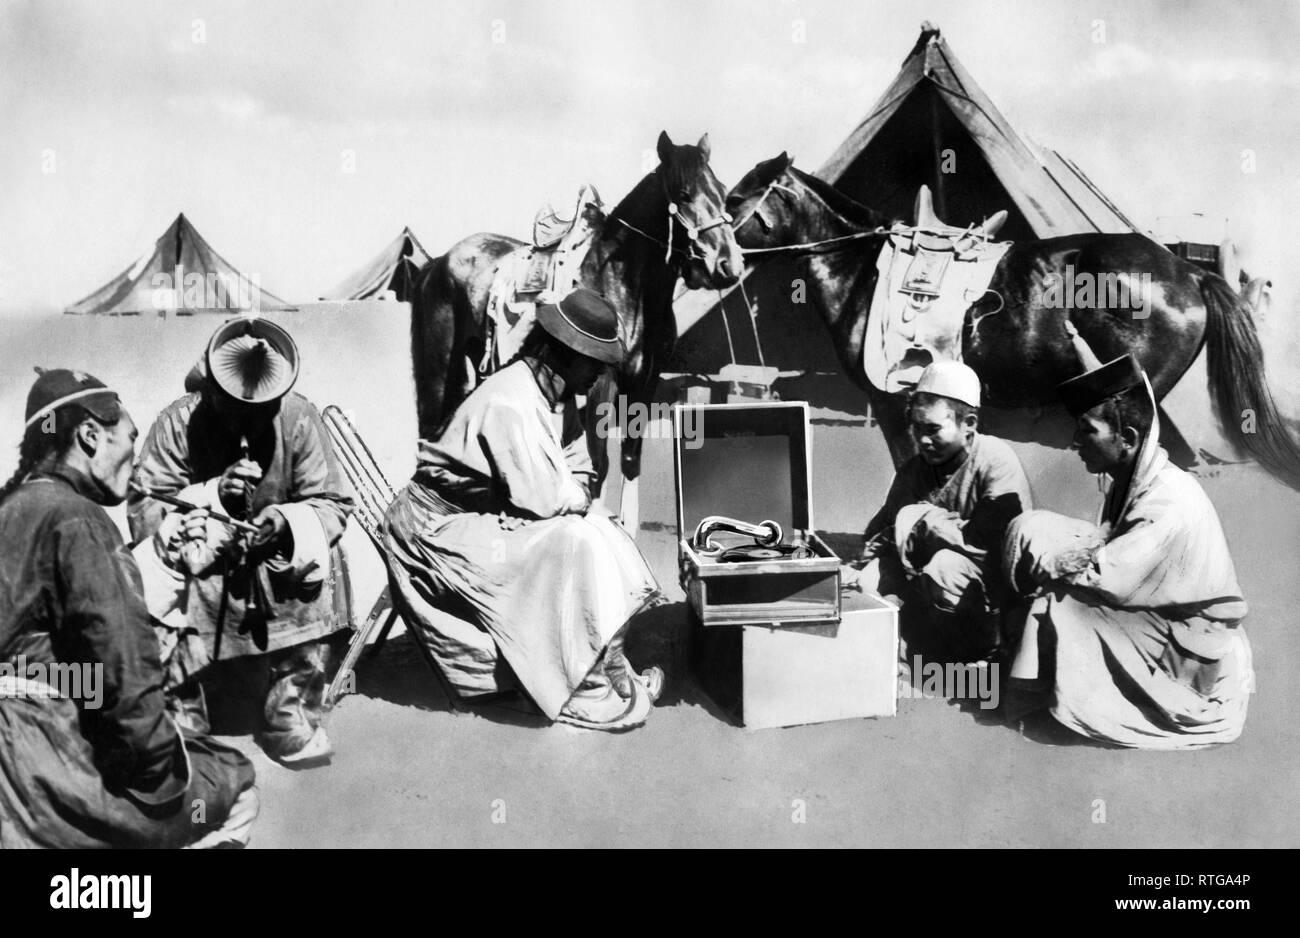 amendment in the desert, Mongolia, 1910-20 - Stock Image